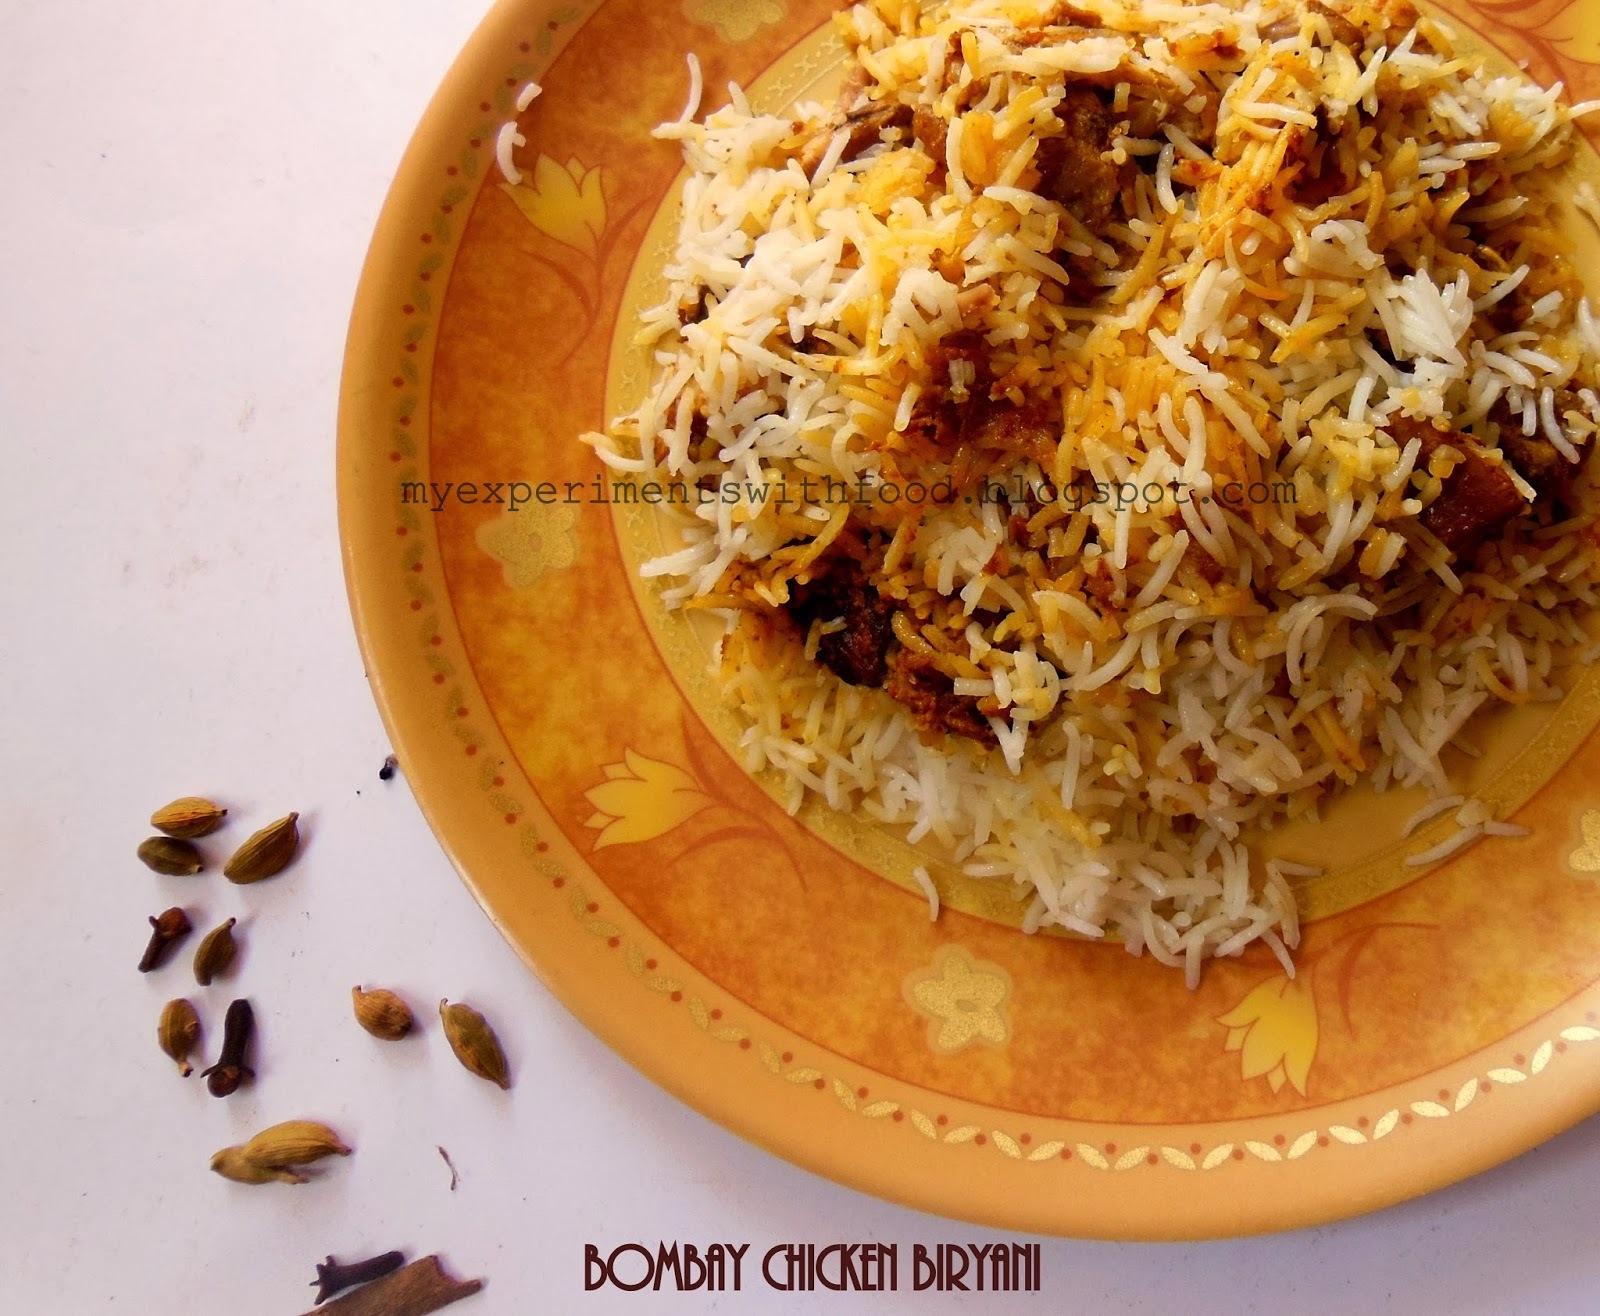 Bombay Chicken Biryani- An anniversary special....